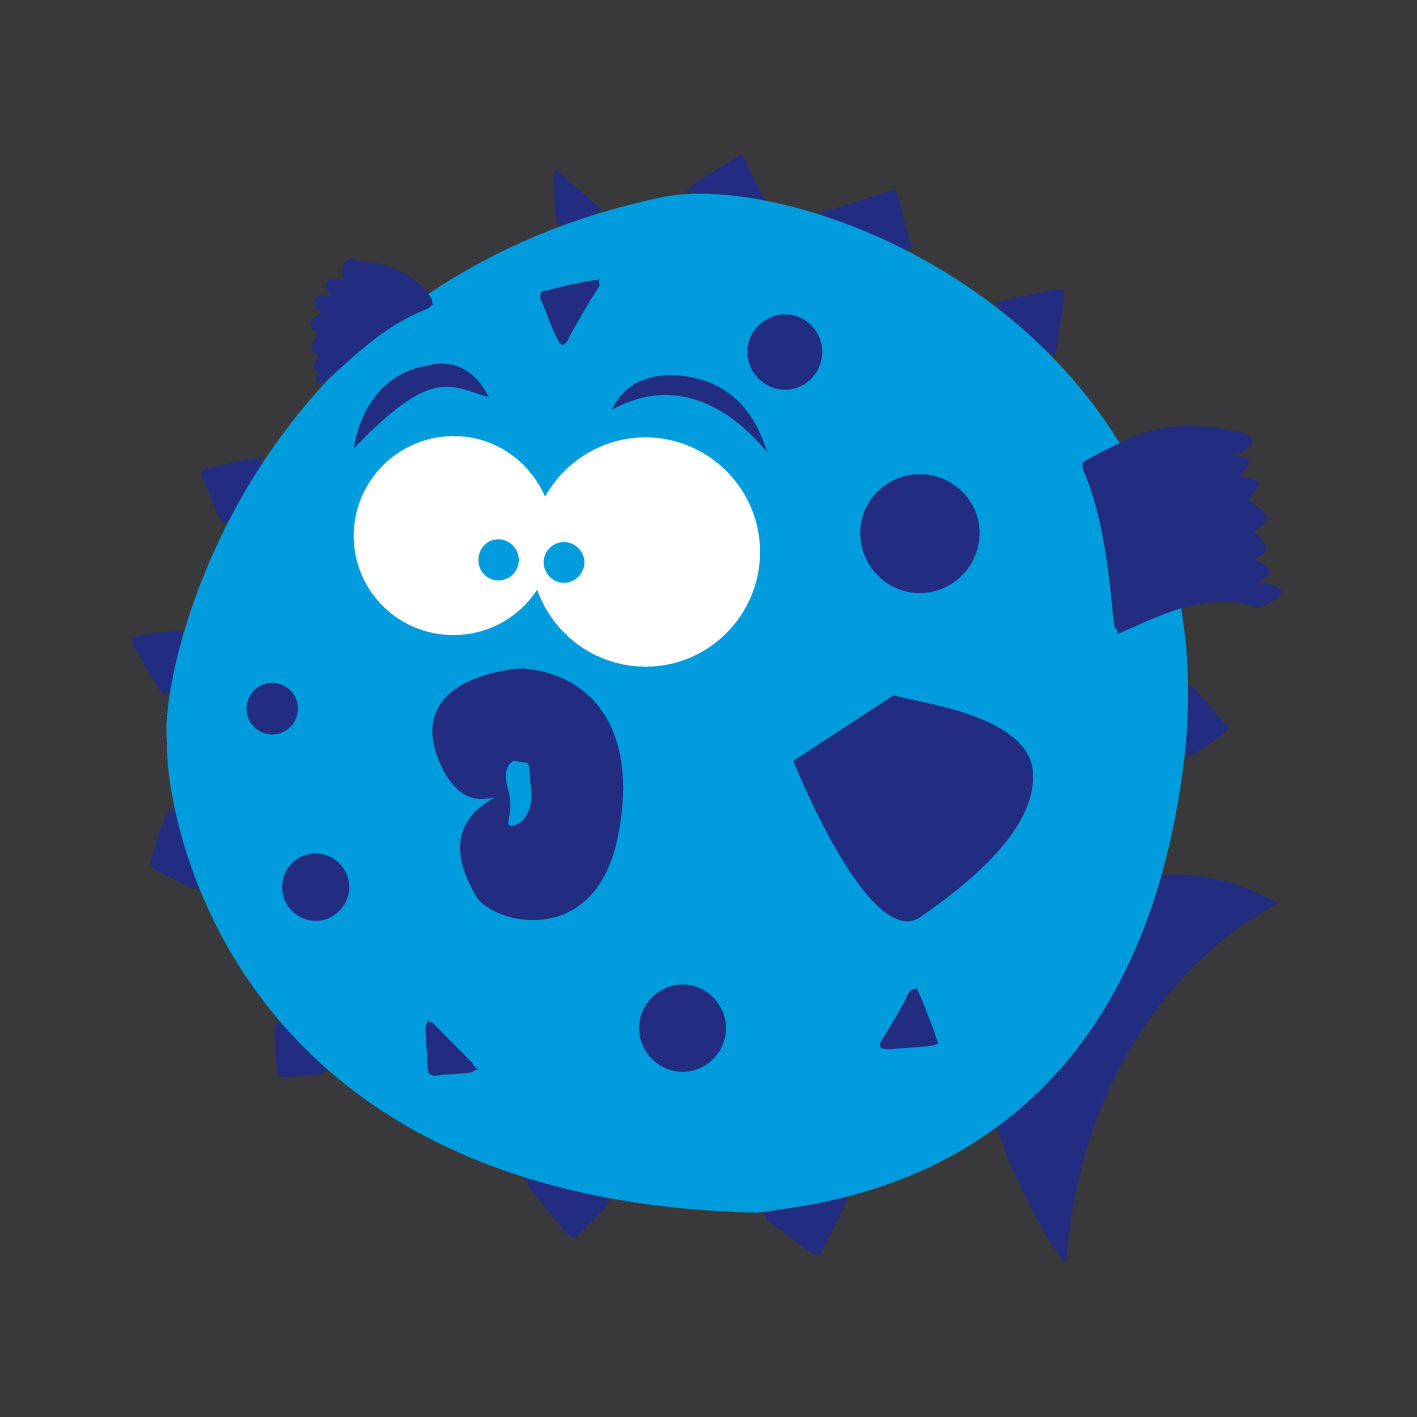 Blowfish 0.4m x 0.4m